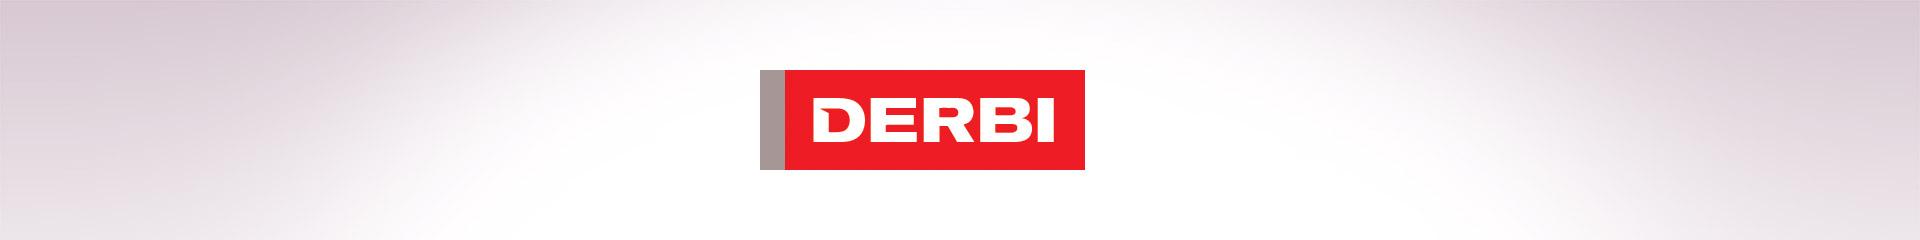 Ricambi scooter Derbi